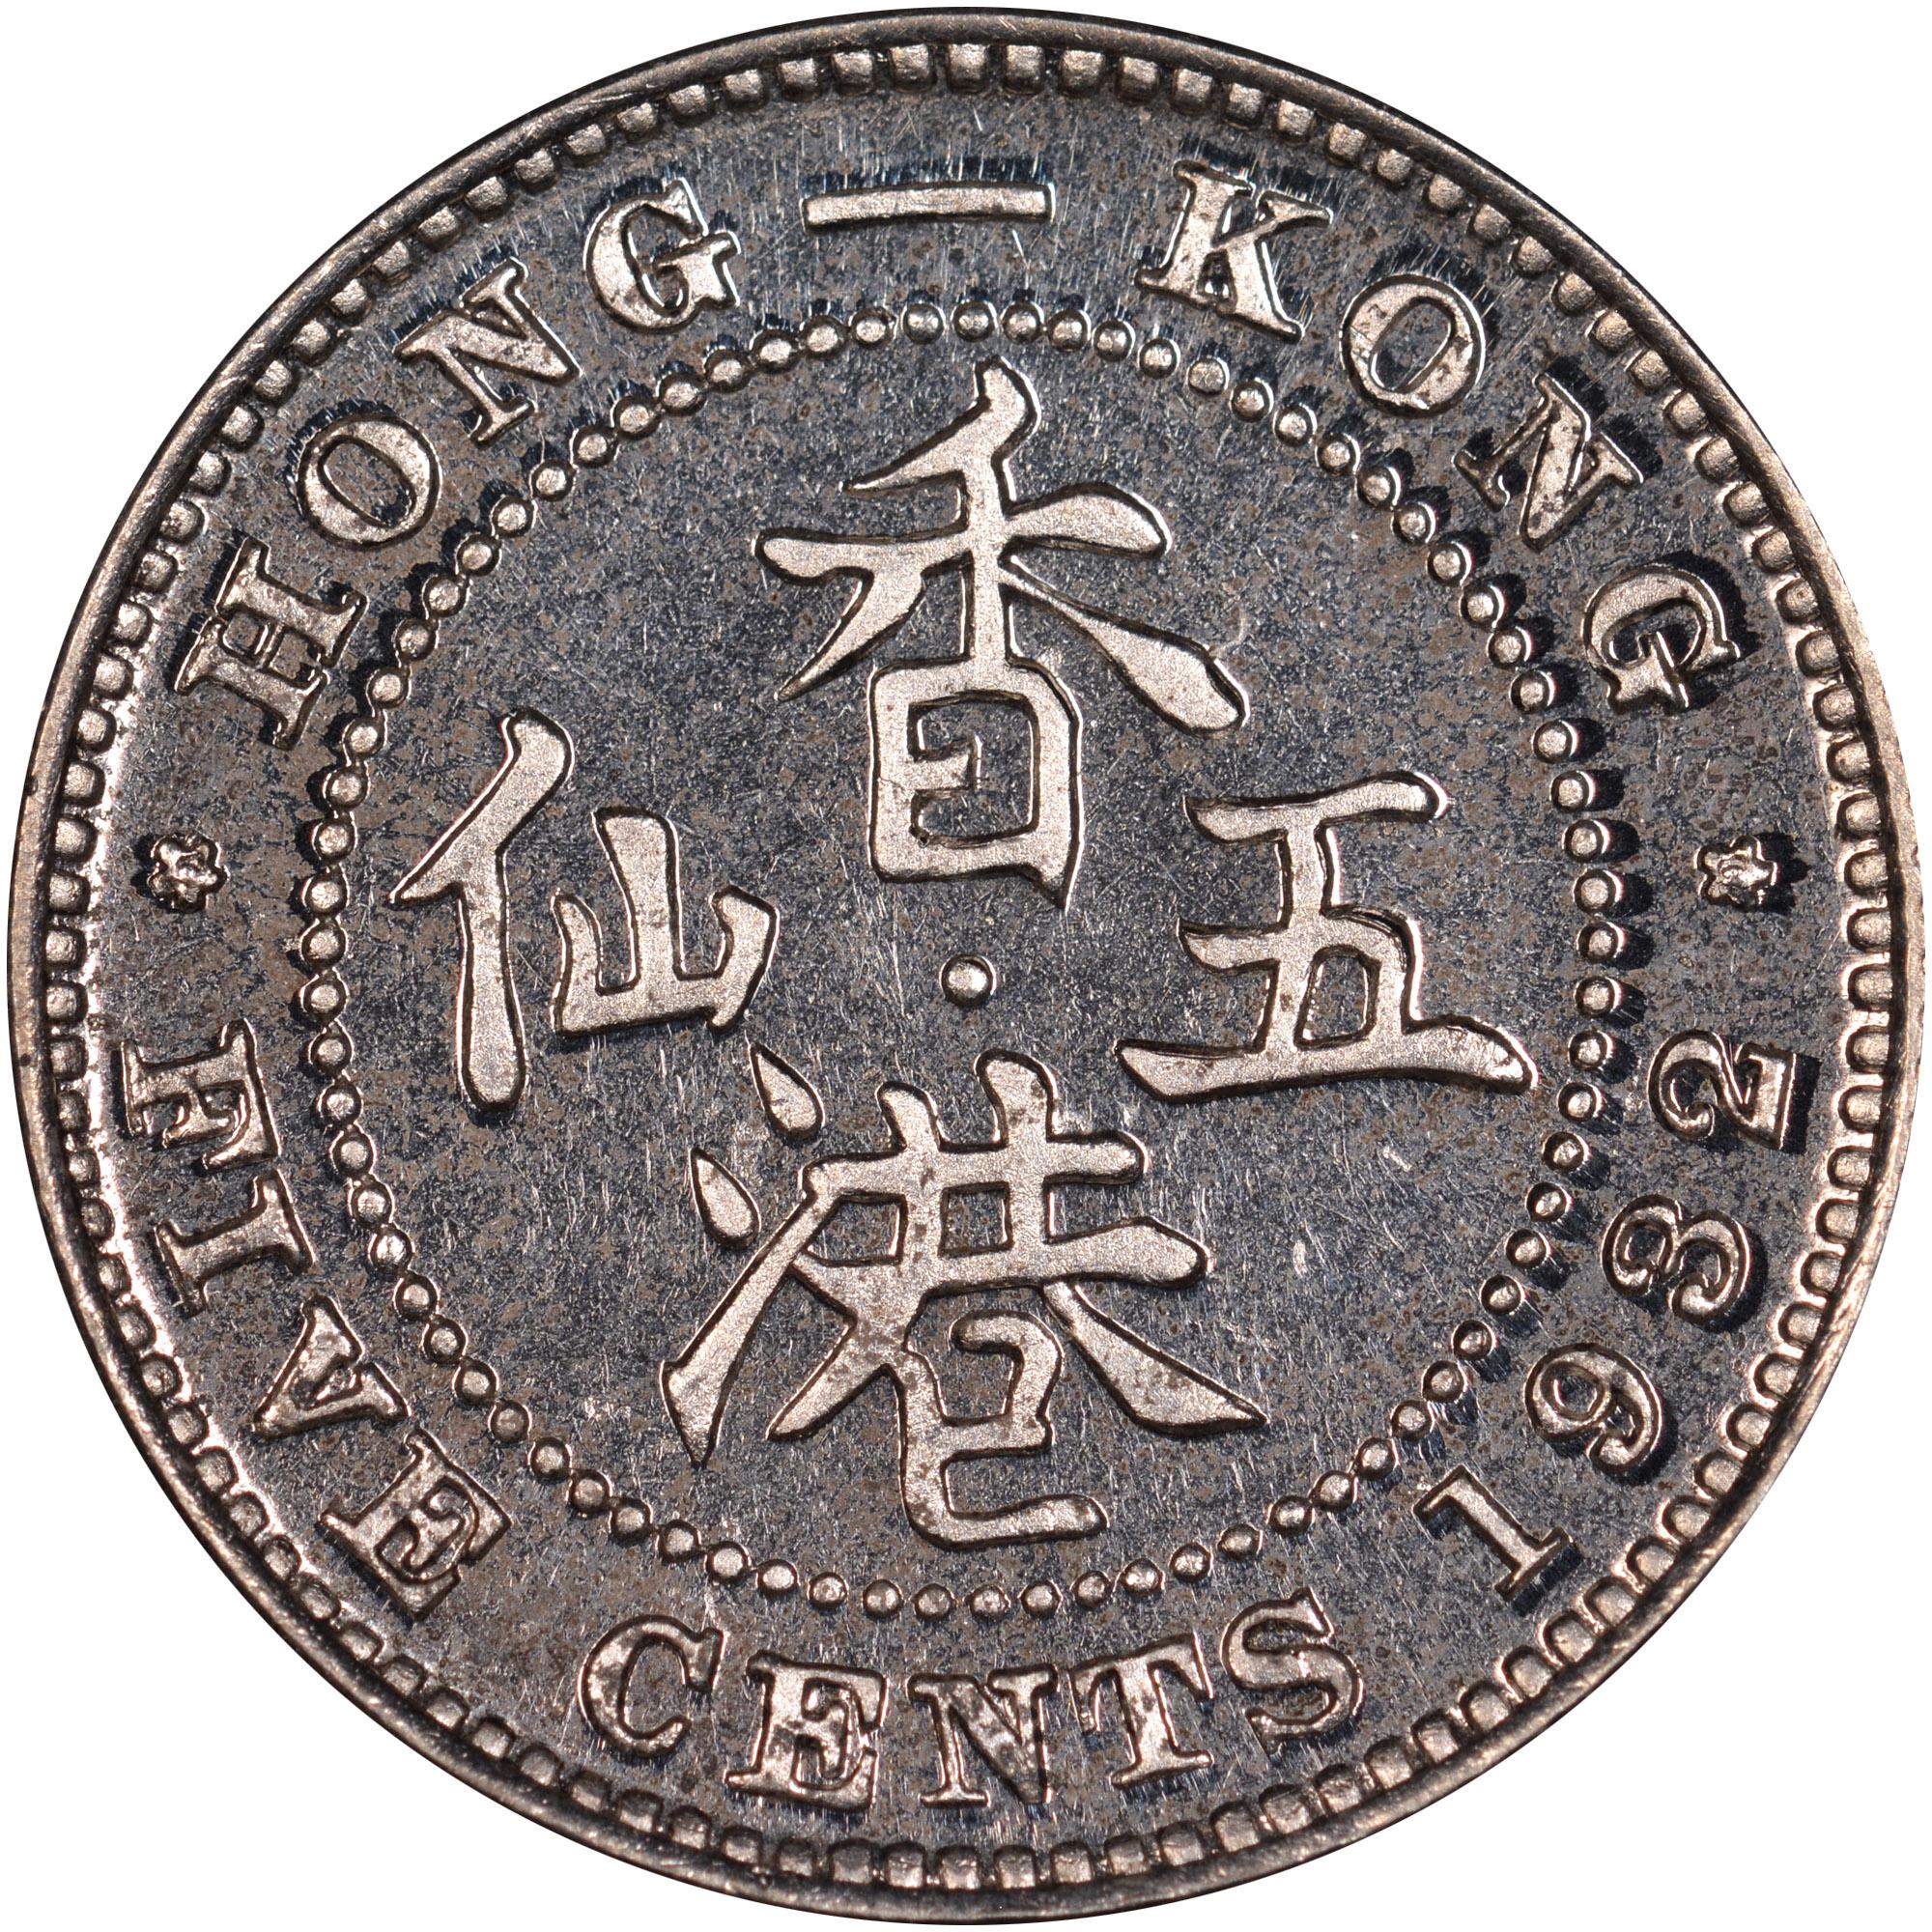 Price Hong Kong Manufacturer: Hong Kong 5 Cents KM 18 Prices & Values